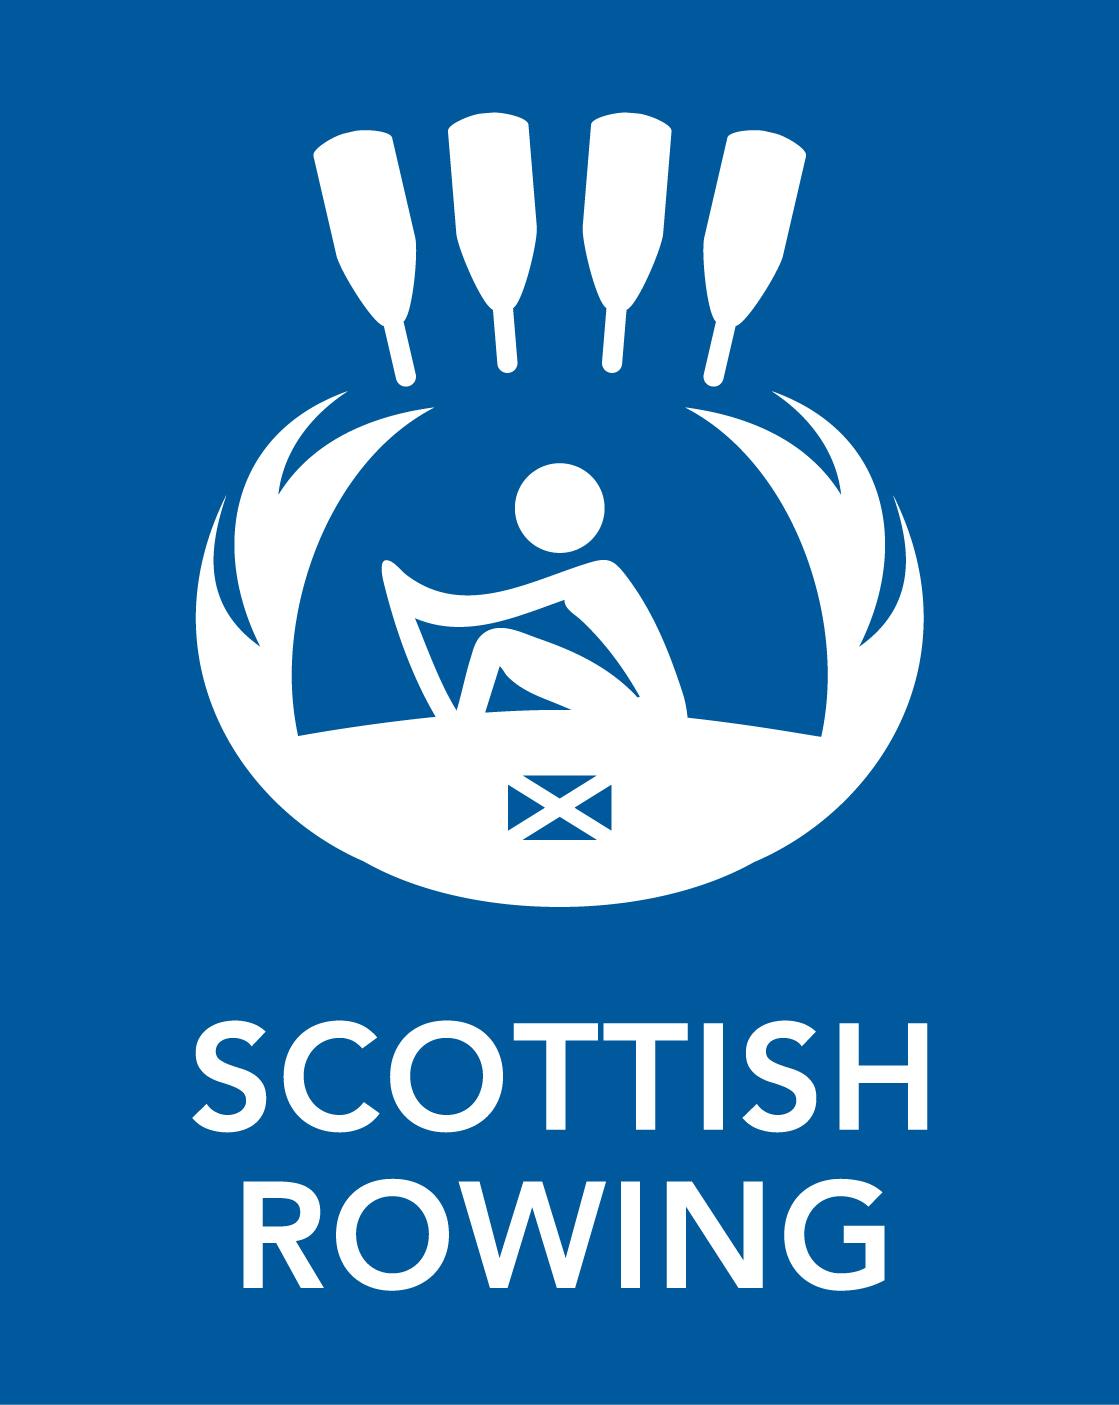 Scottish_rowing_logo